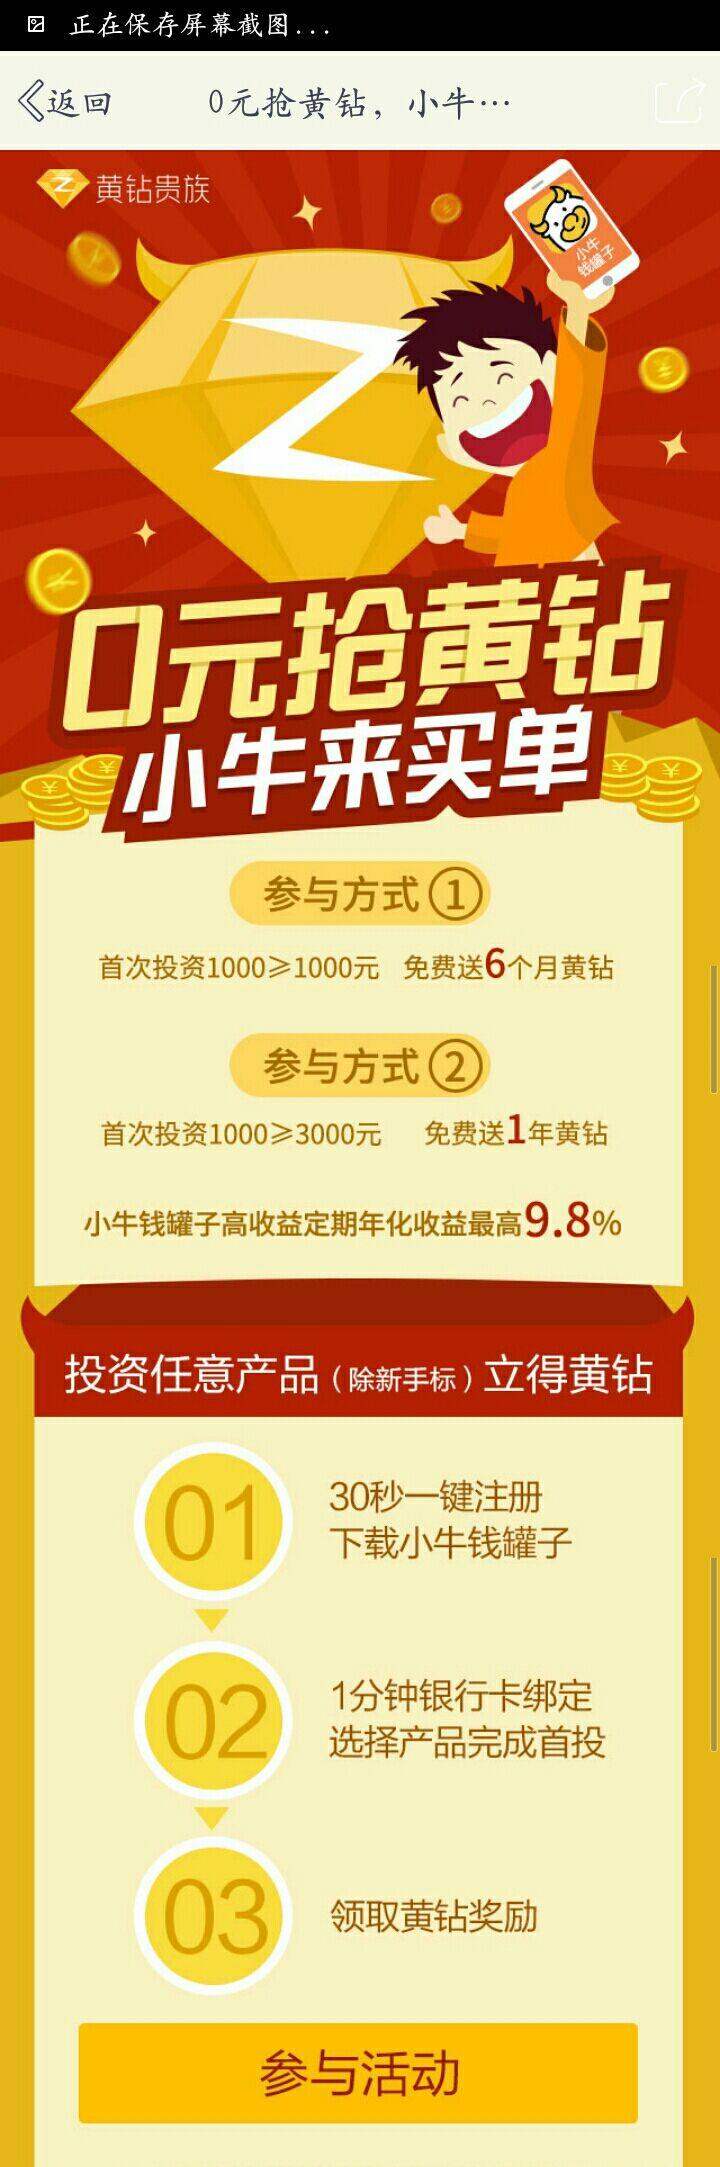 QQ黄钻联合小牛钱罐子撸1年/6个QQ黄钻CDK兑换码! 活动线报 第2张